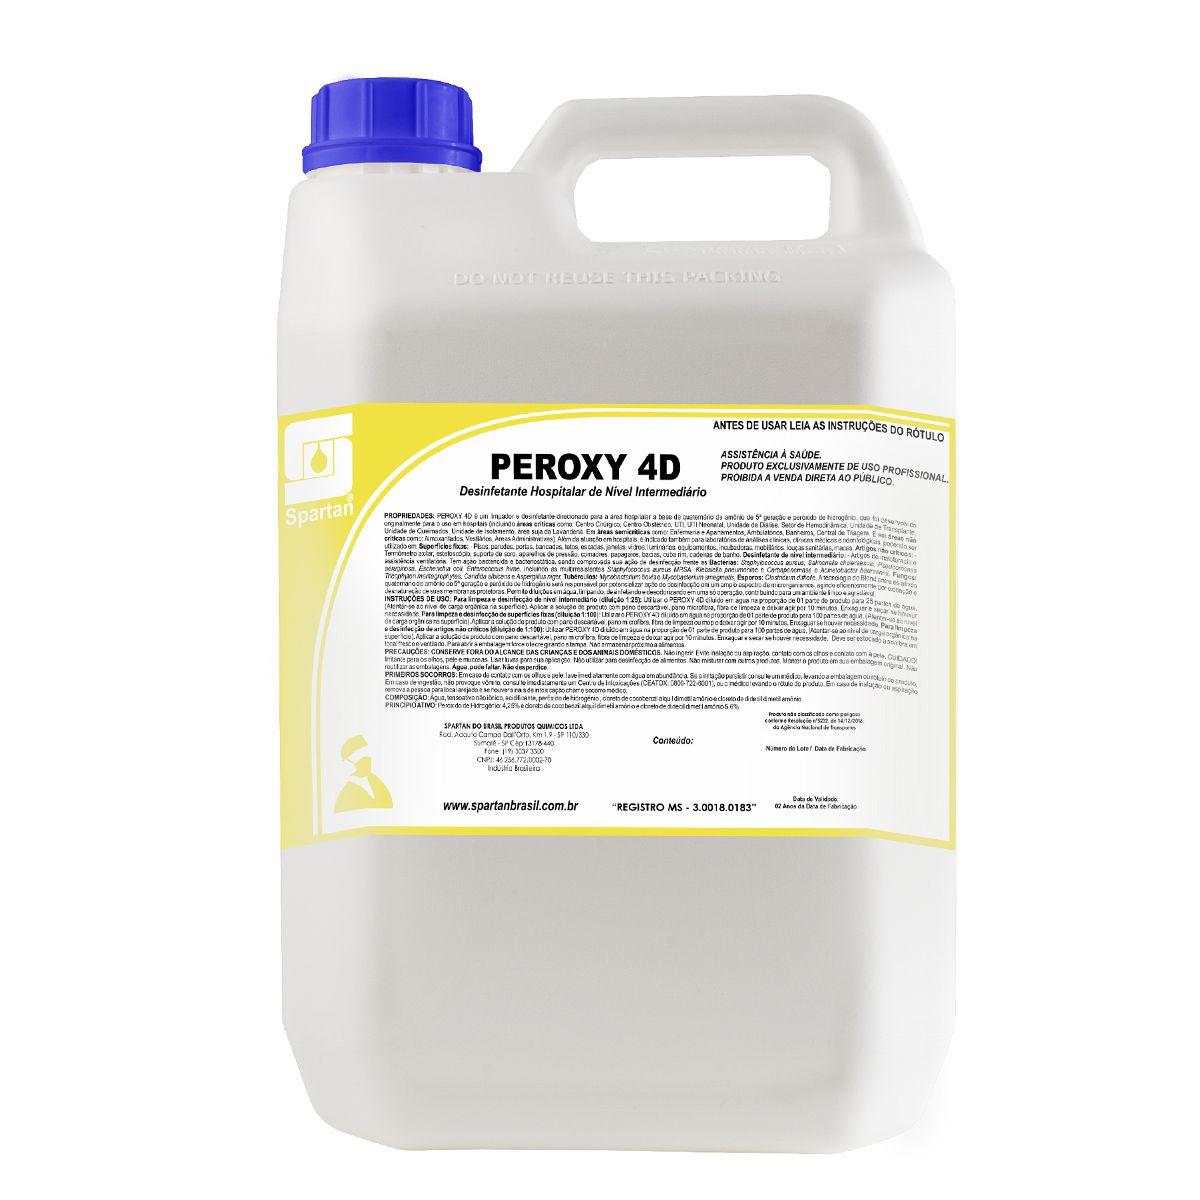 Peroxy 4D - Desinfetante de Alto Desempenho Indicado Para Área Hospitalar - 5 Litros